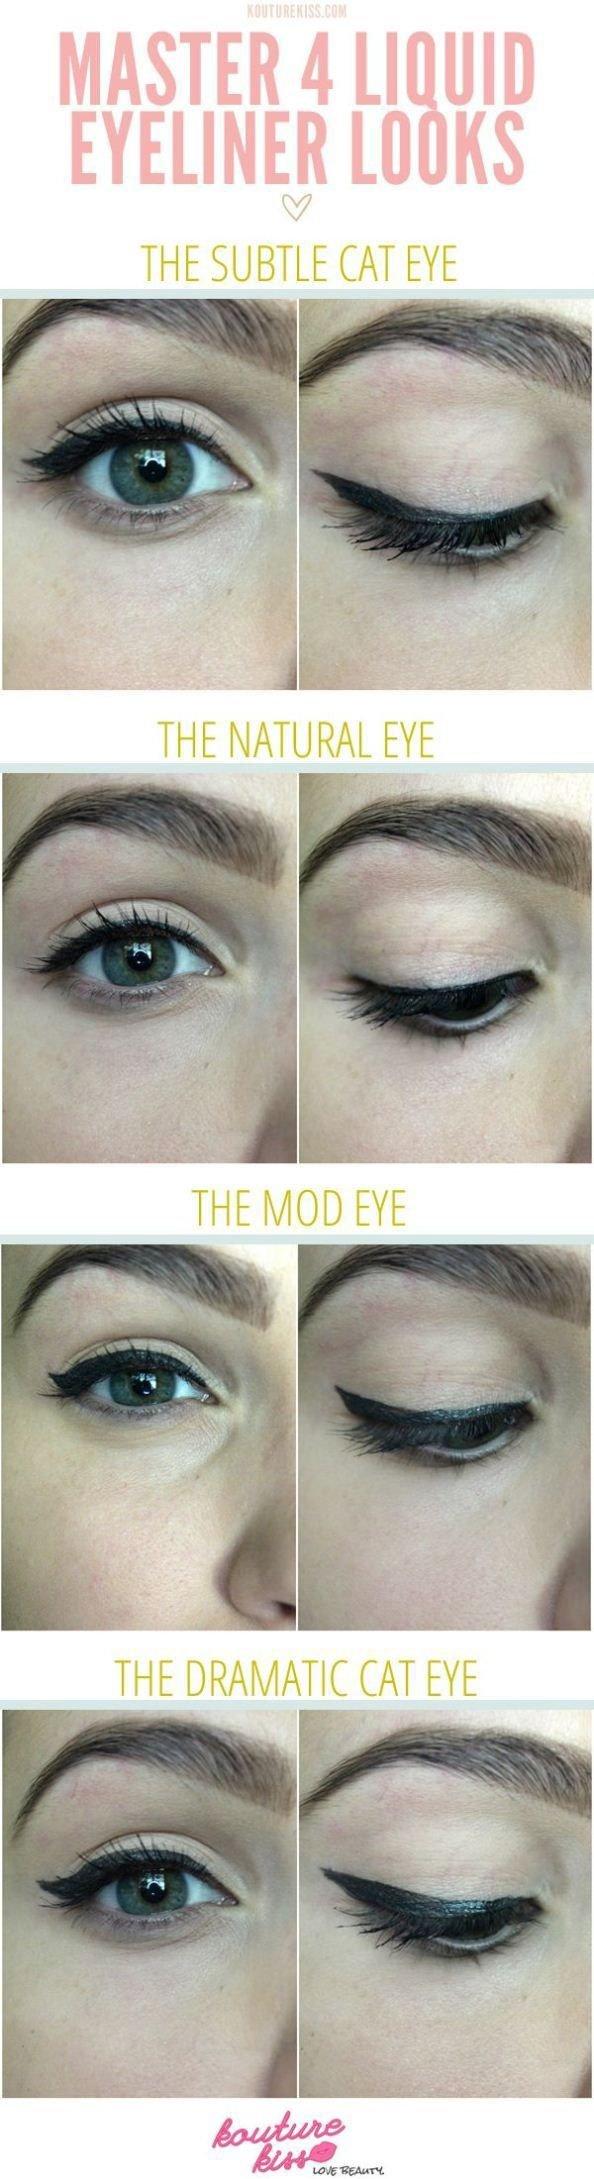 eyebrow,face,eye,eyelash,organ,